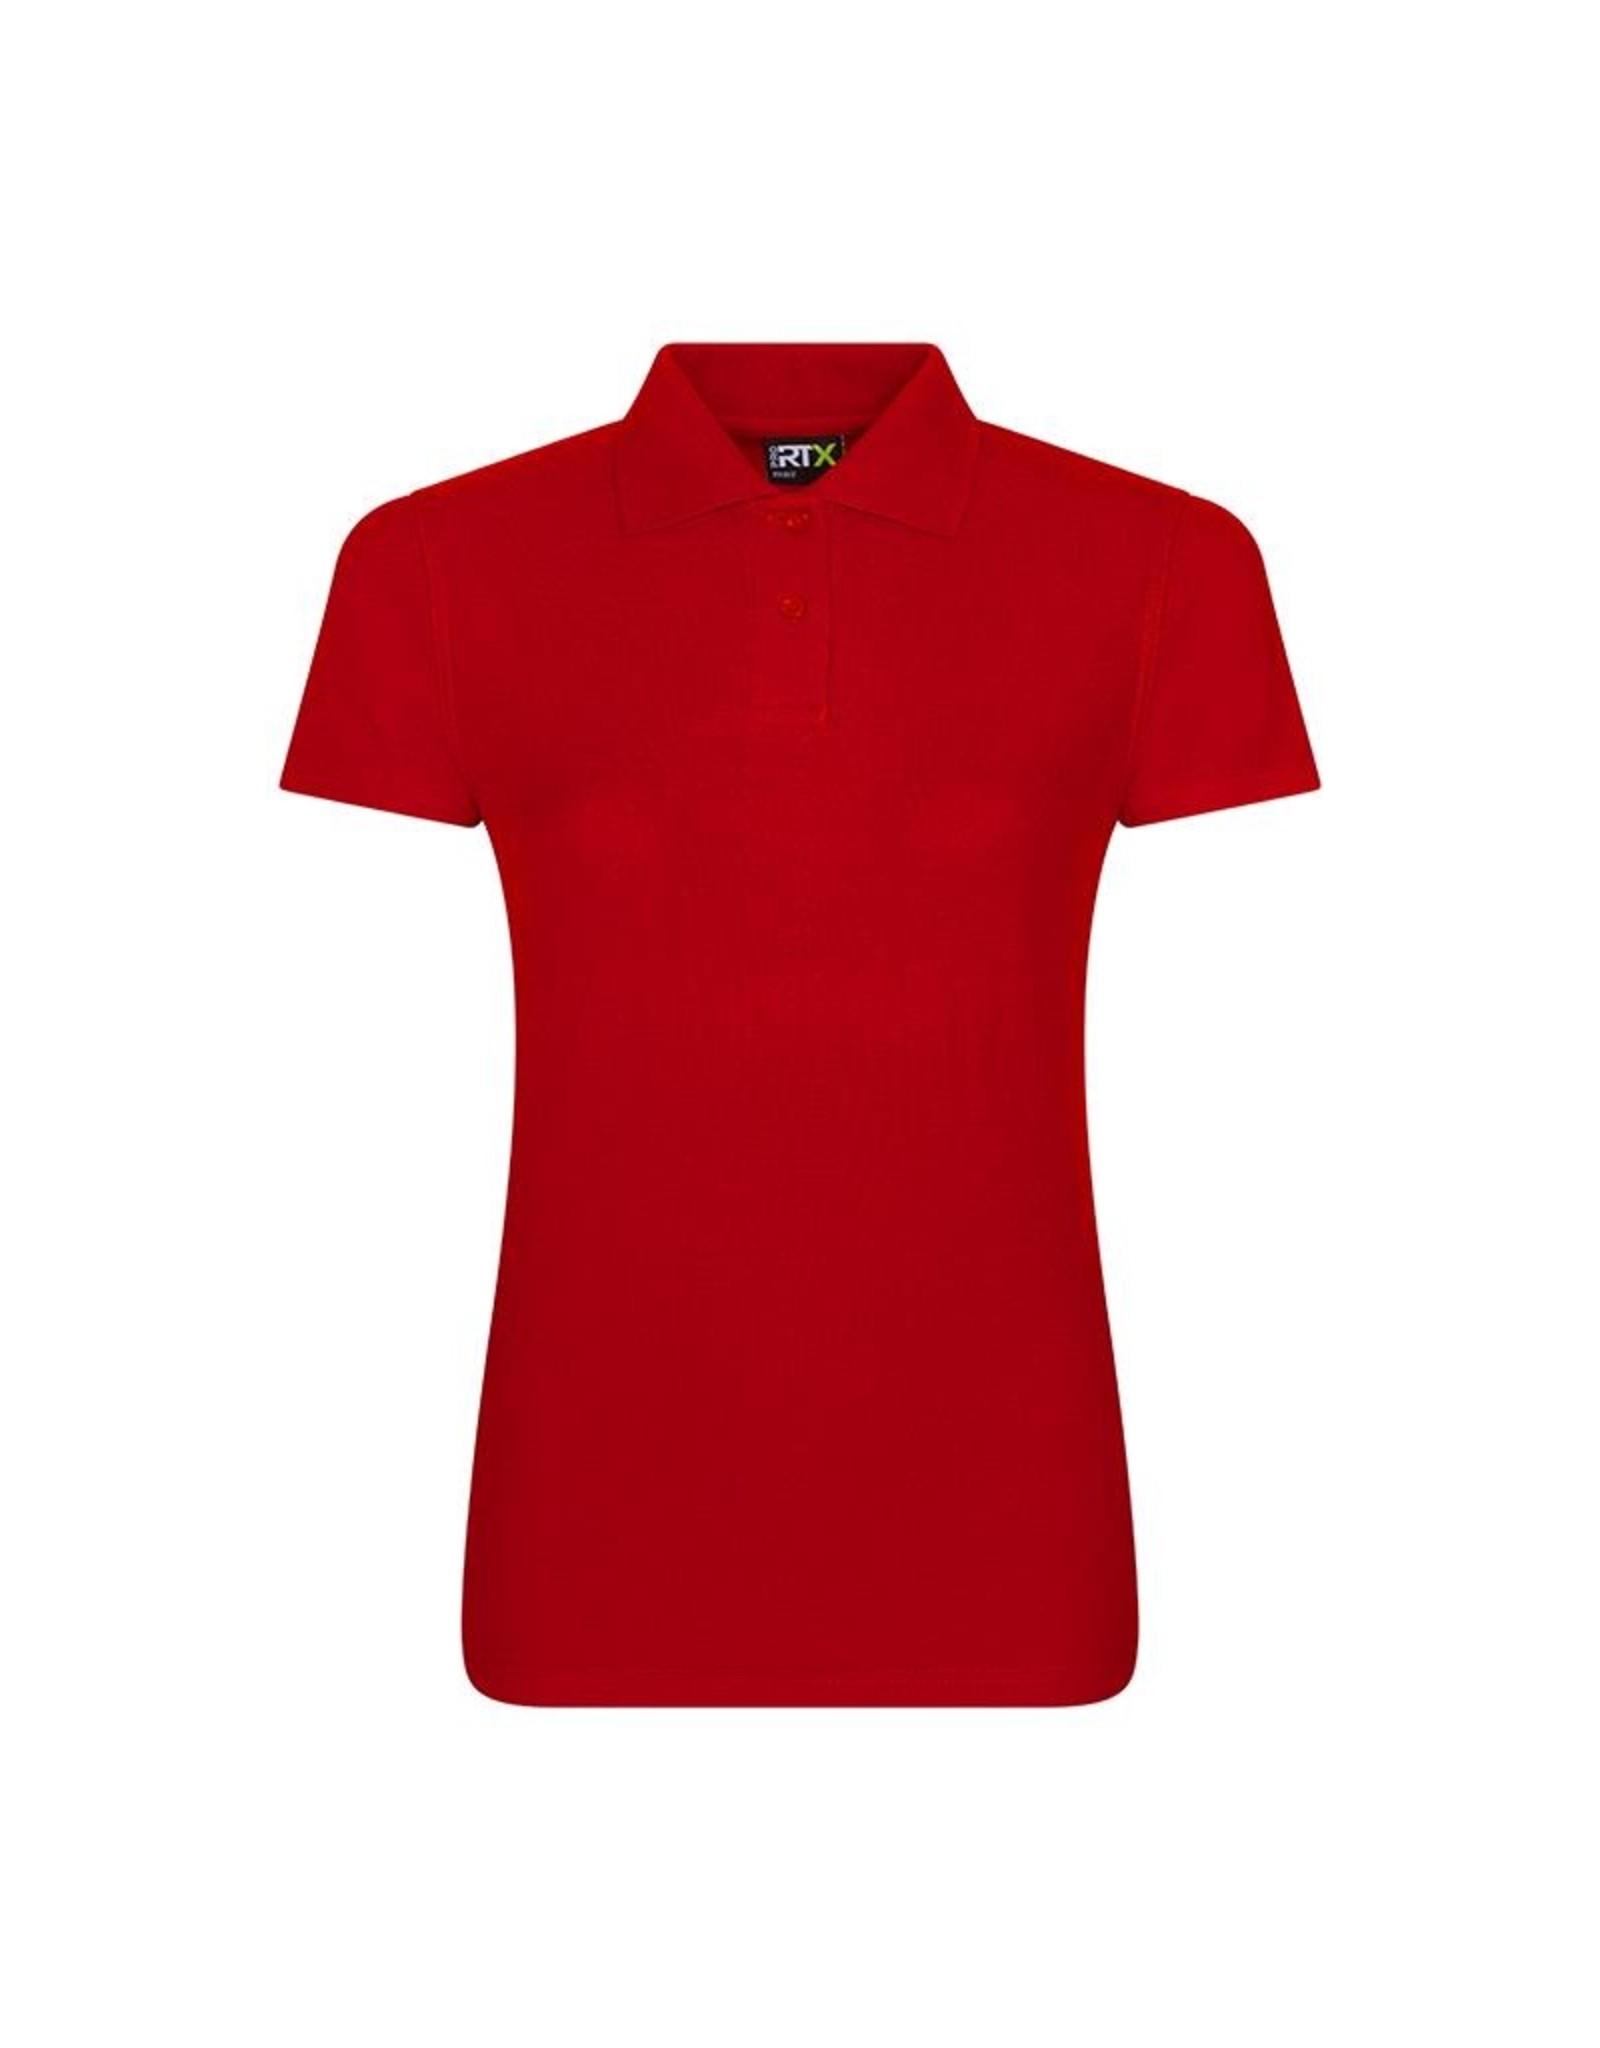 Pro RTX Dames POLOSHIRT piqué workwear rood